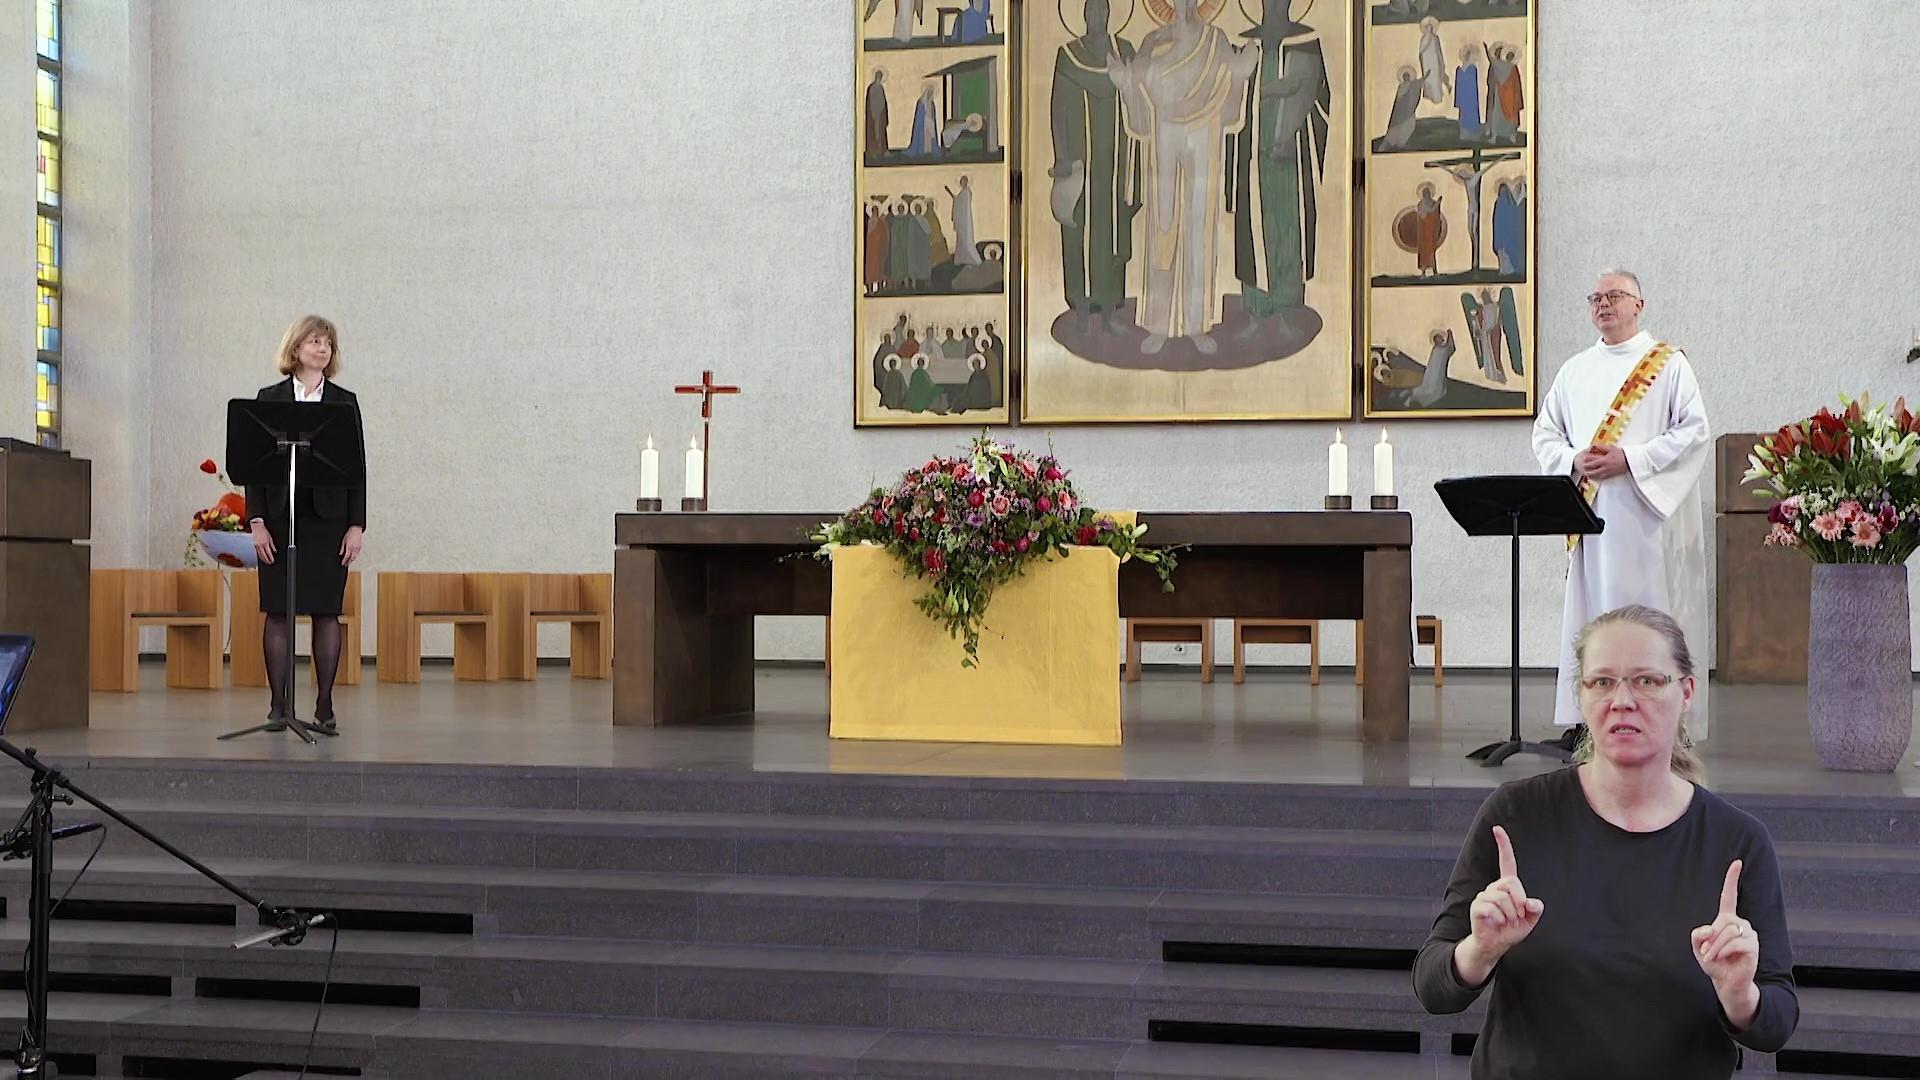 Oek Gottesdienst Ostersonntag2021 aus Aarau Moment1